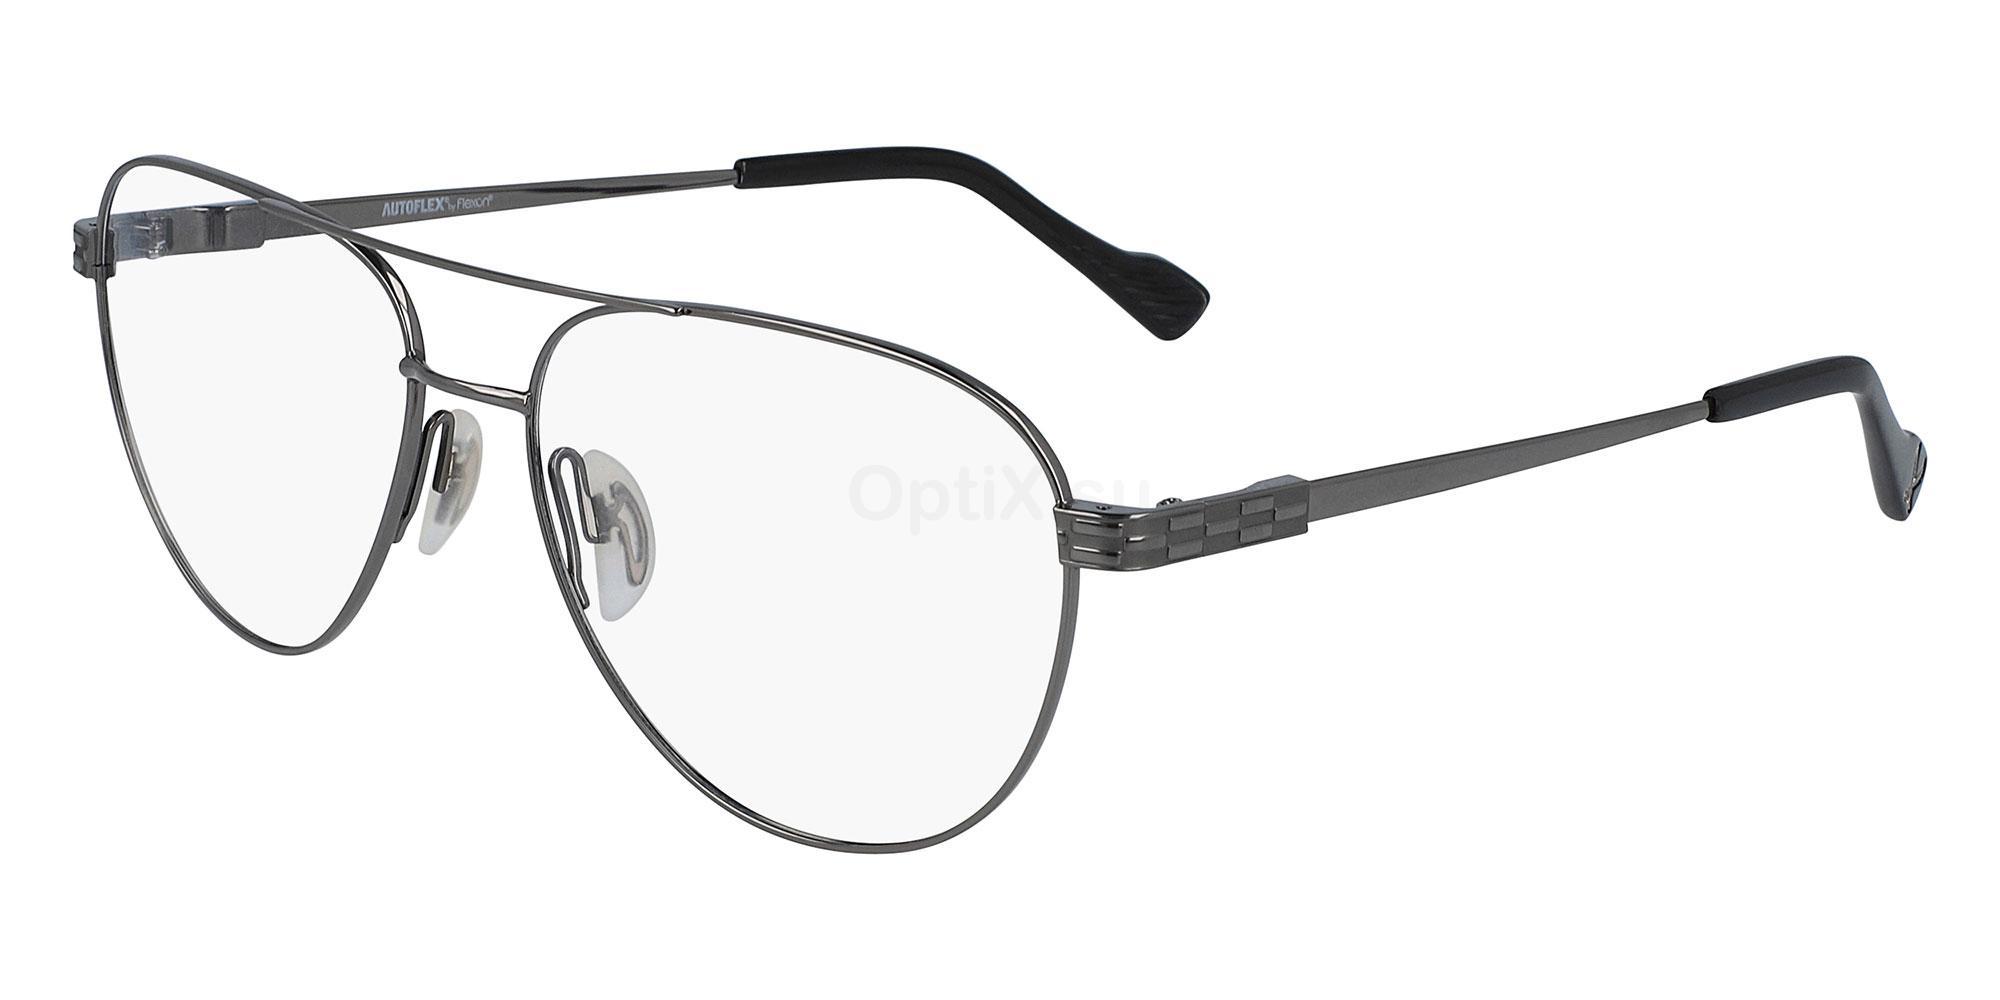 033 AUTOFLEX 110 Glasses, Flexon